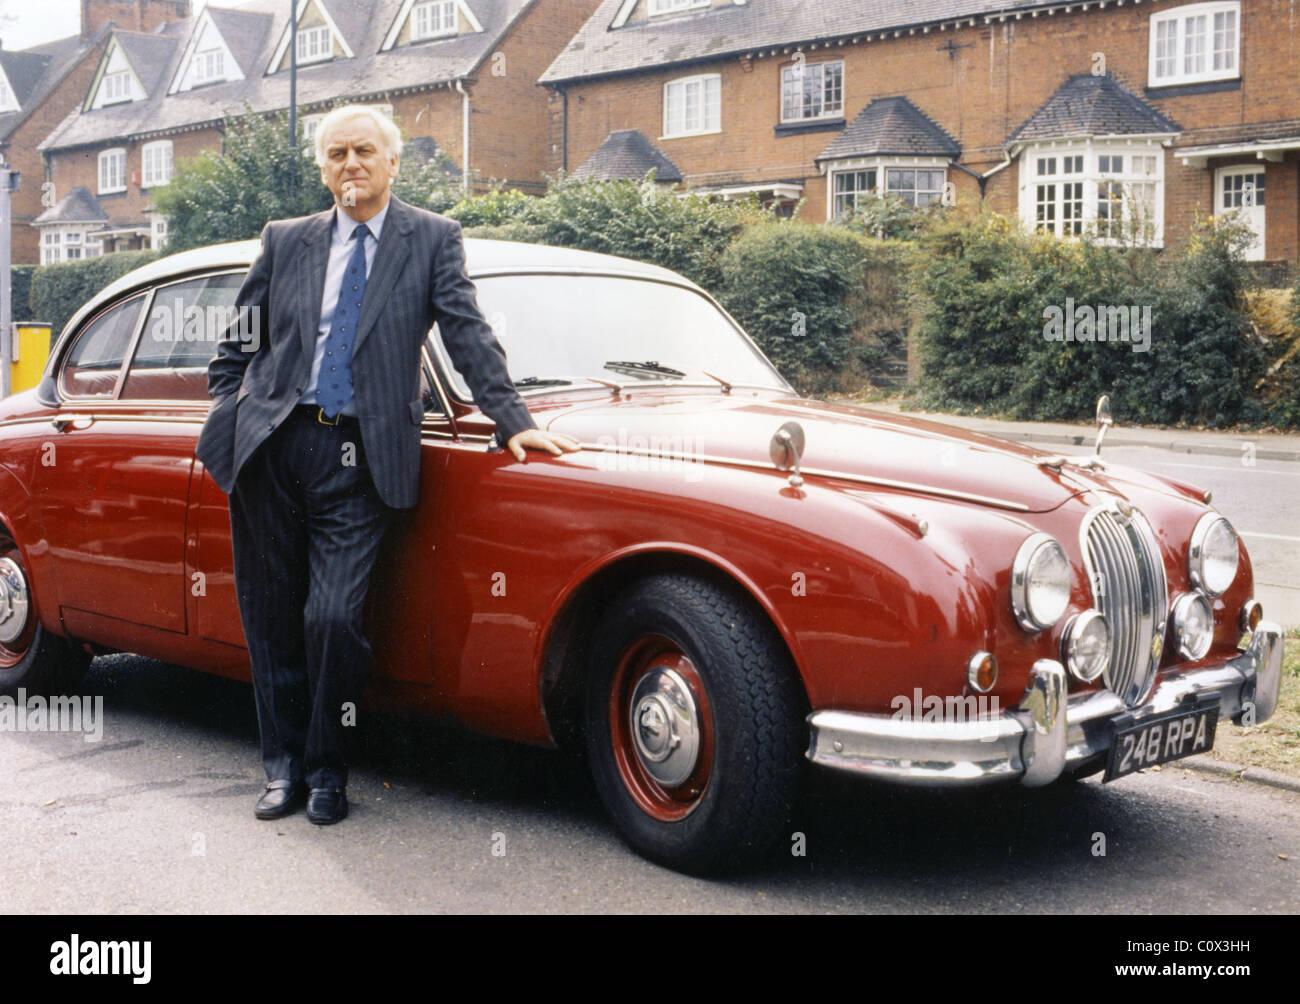 Inspector Morse Car For Sale